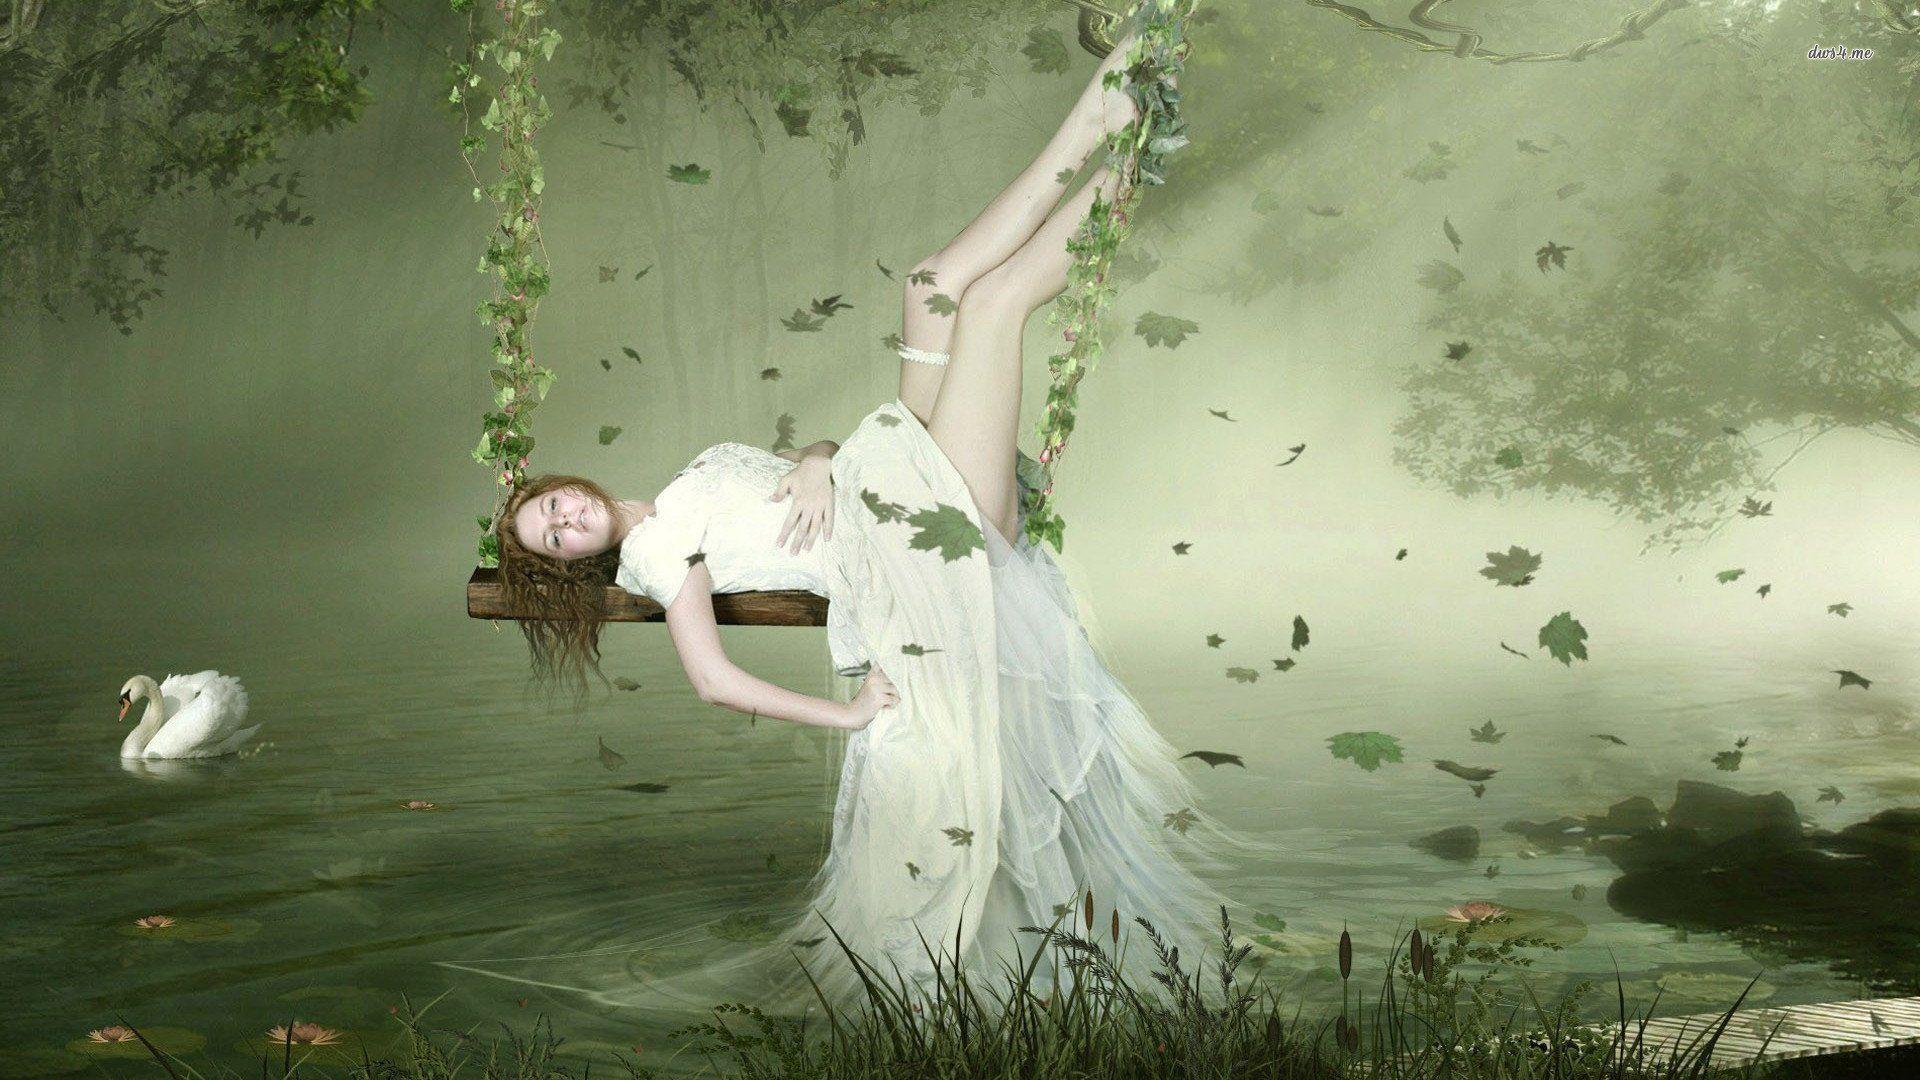 Swing Wallpapers - WallDevil